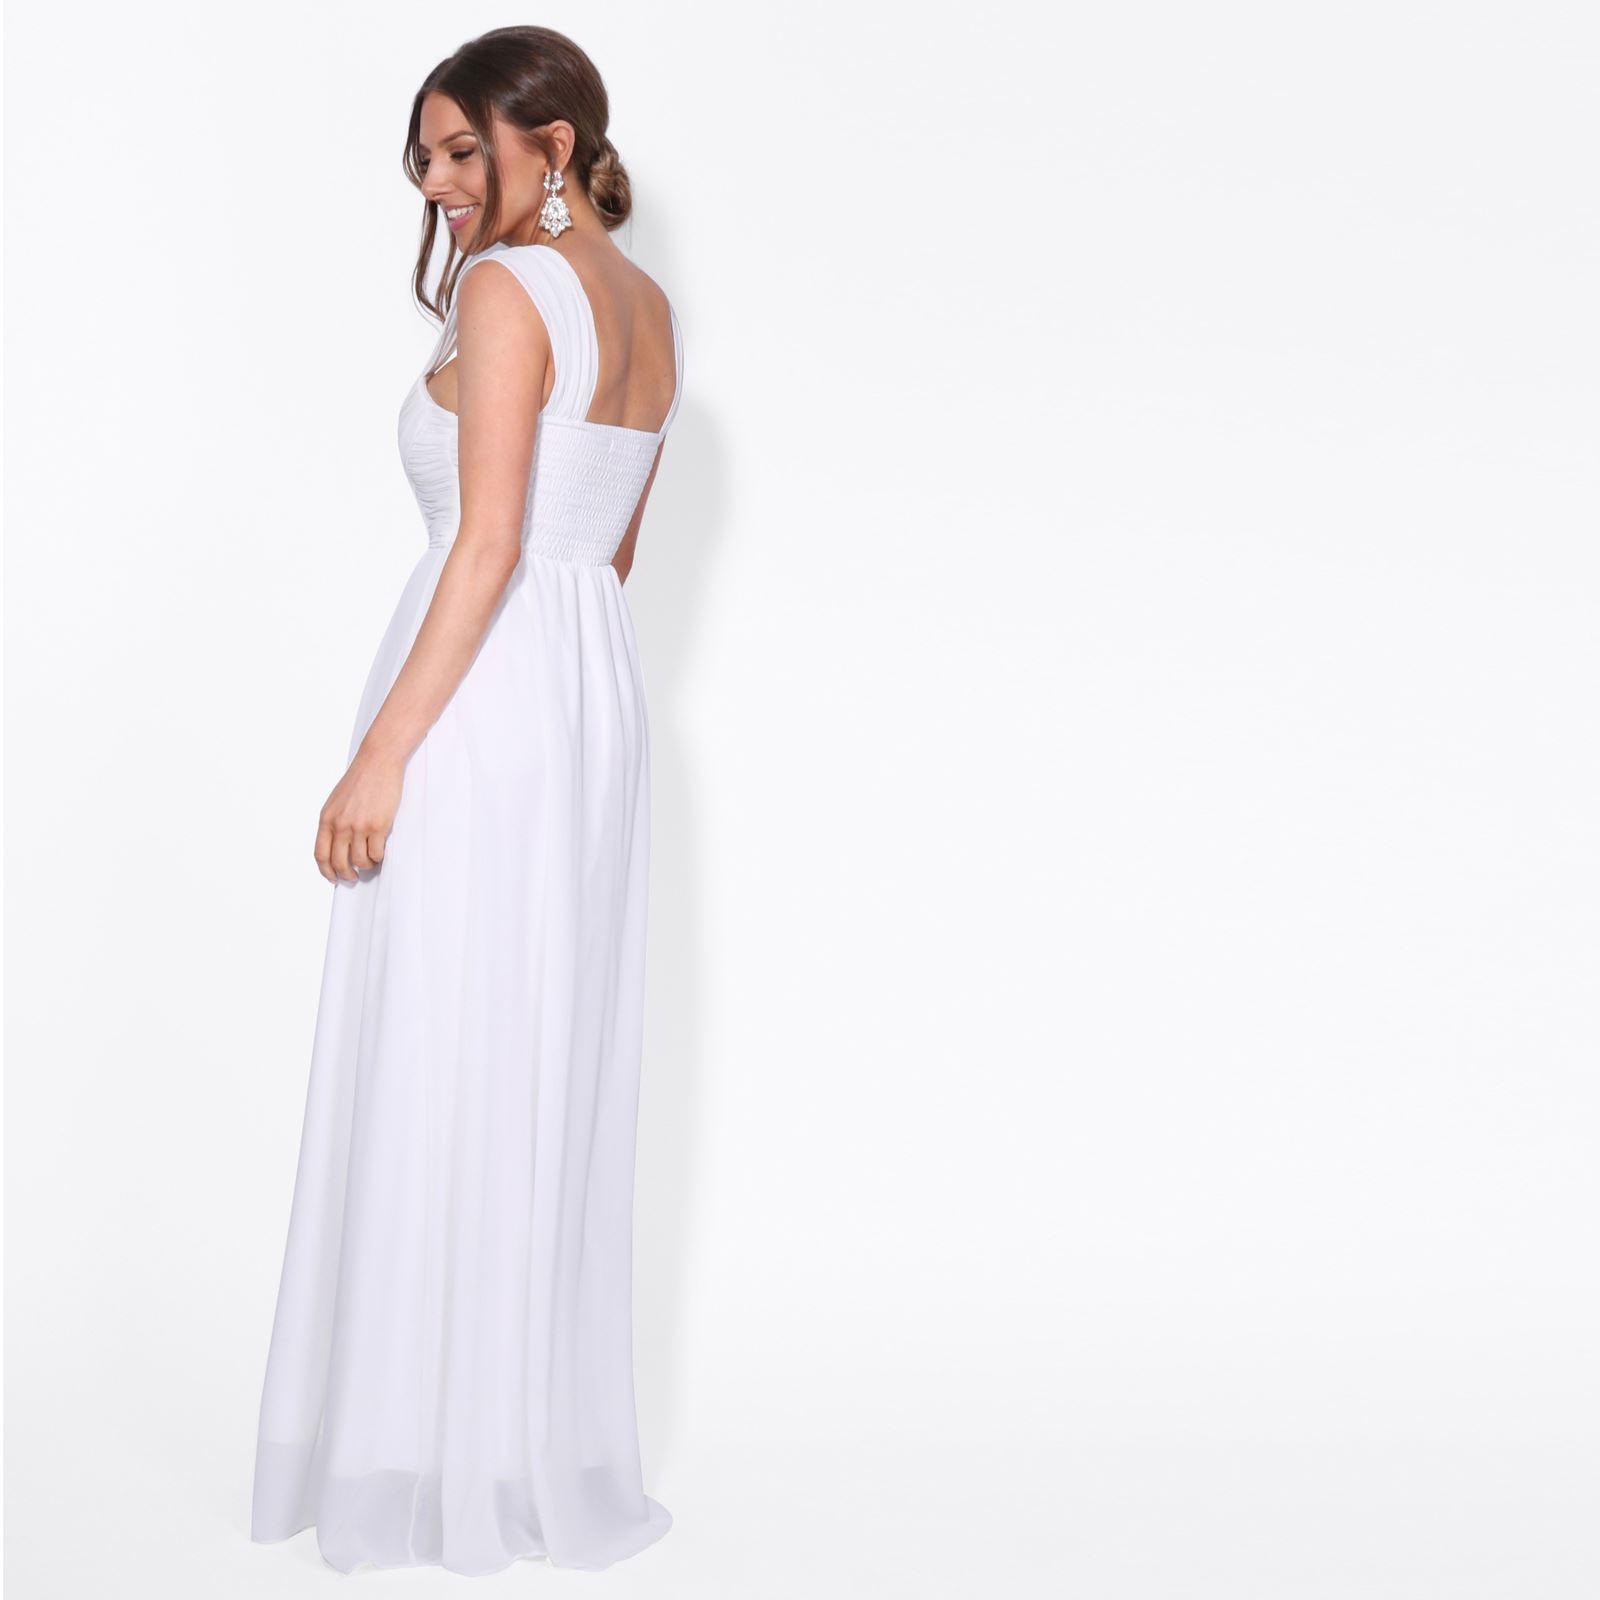 Womens-Elegant-Evening-One-Shoulder-Maxi-Bridal-Prom-Dress-Cocktail-Wedding-8-18